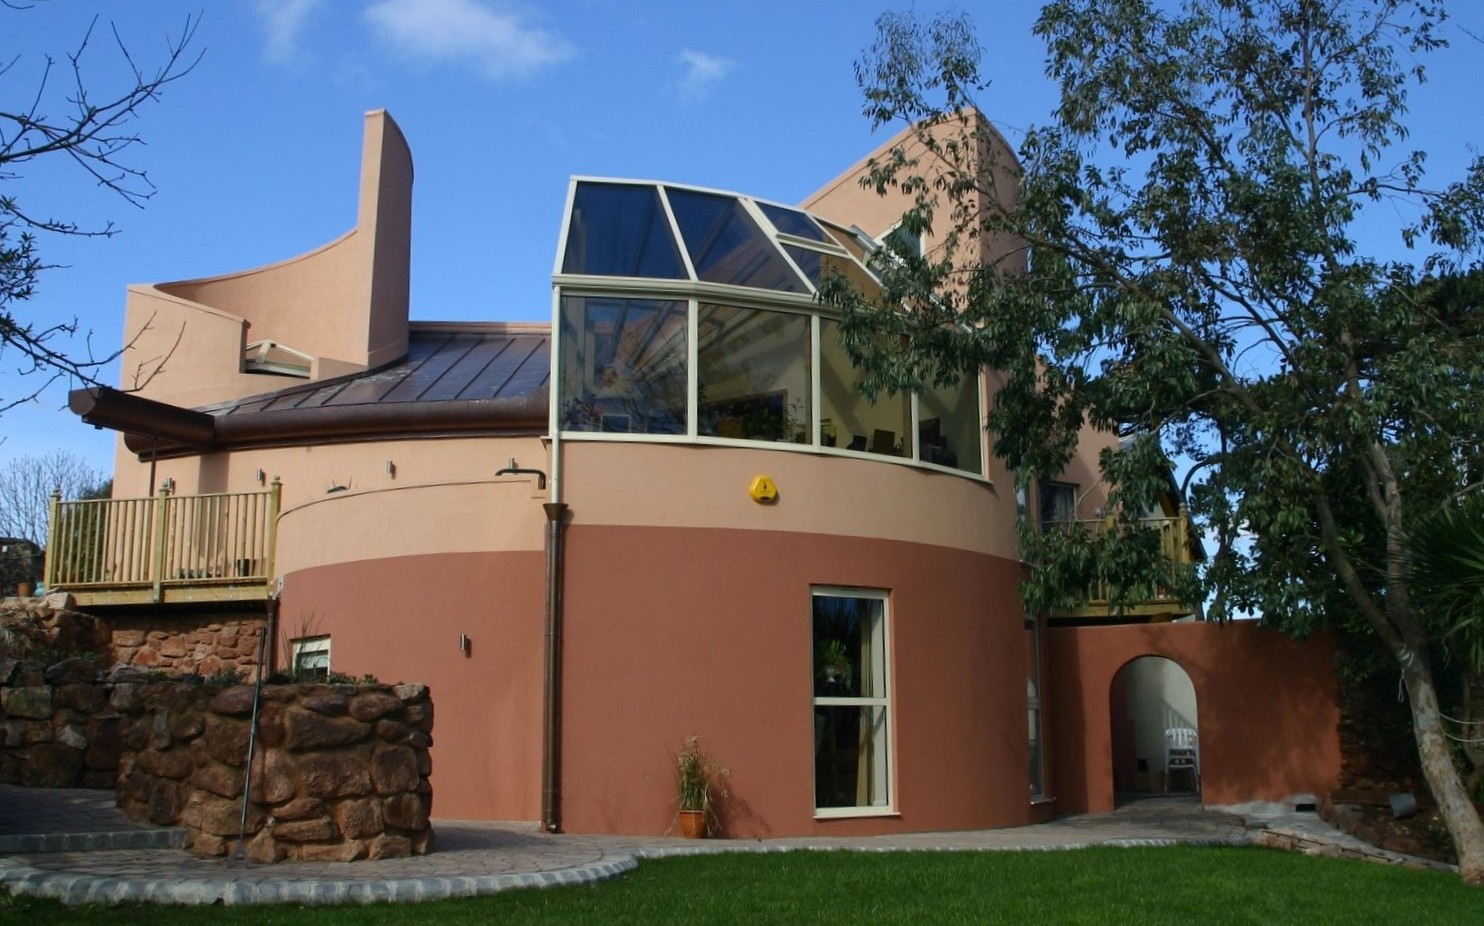 Round house at shaldon devon becowallform - Round shaped house designs ...